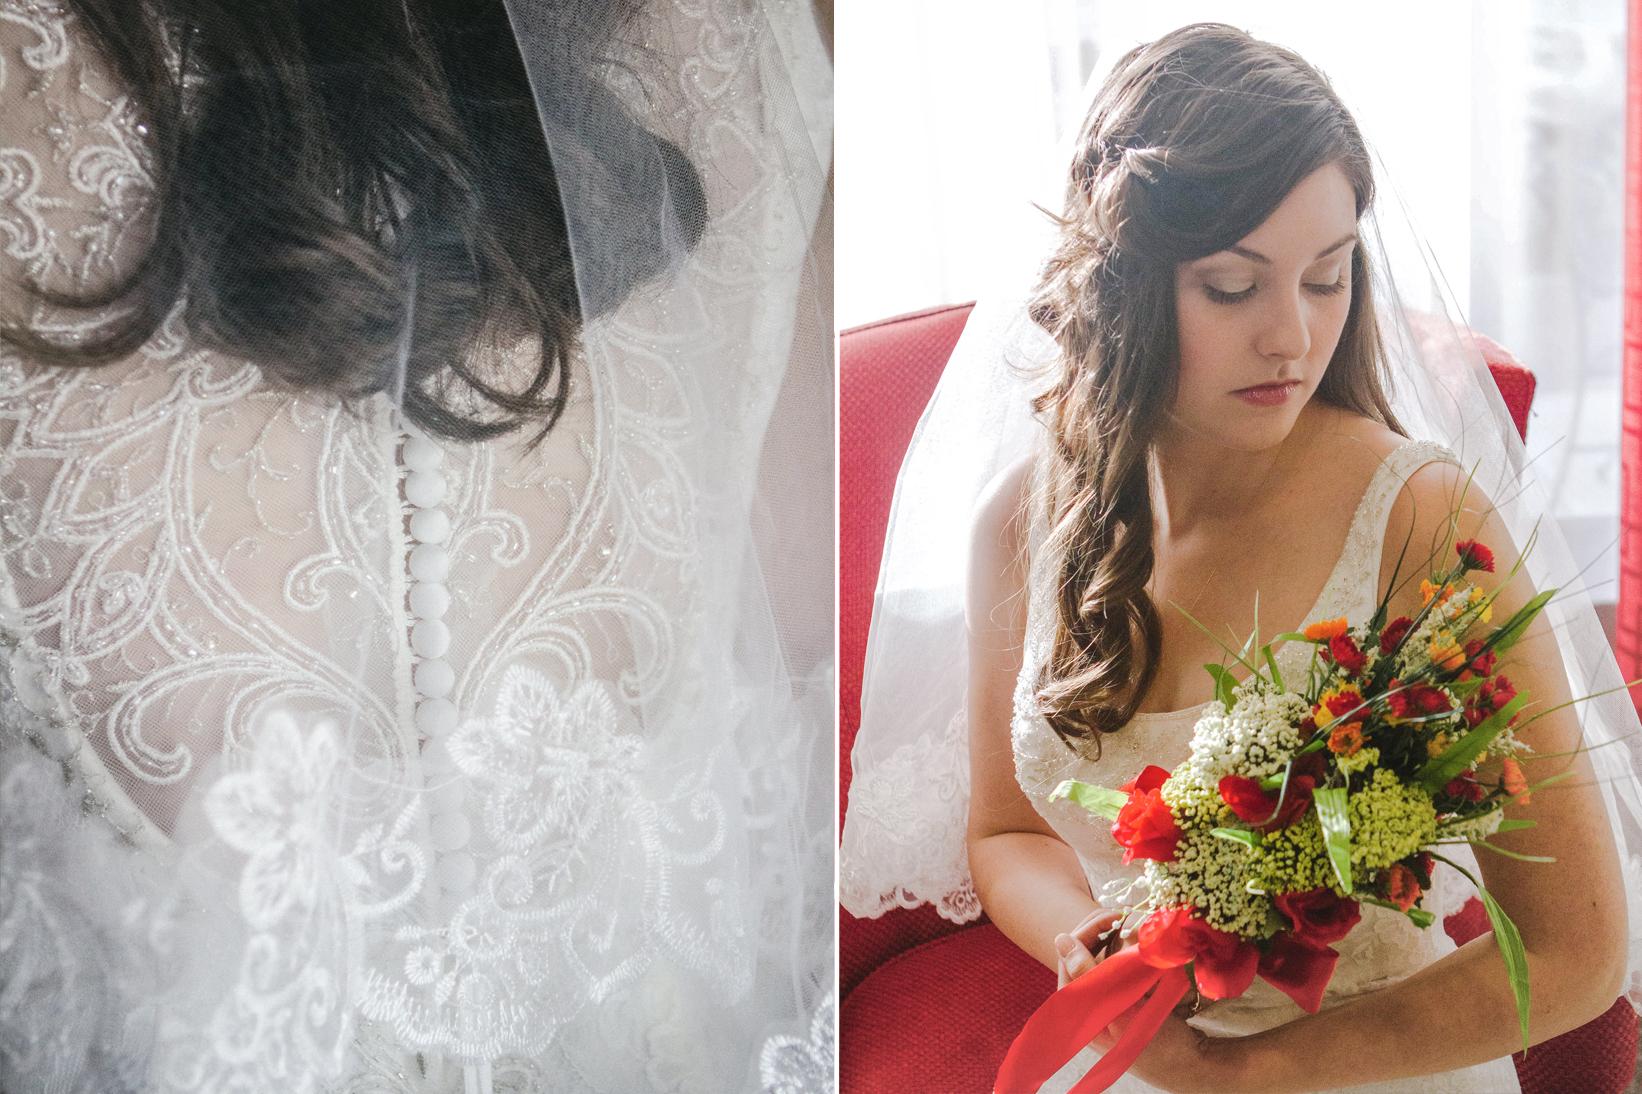 Harrison + Alicia [wedding] | www.klpstudios.co